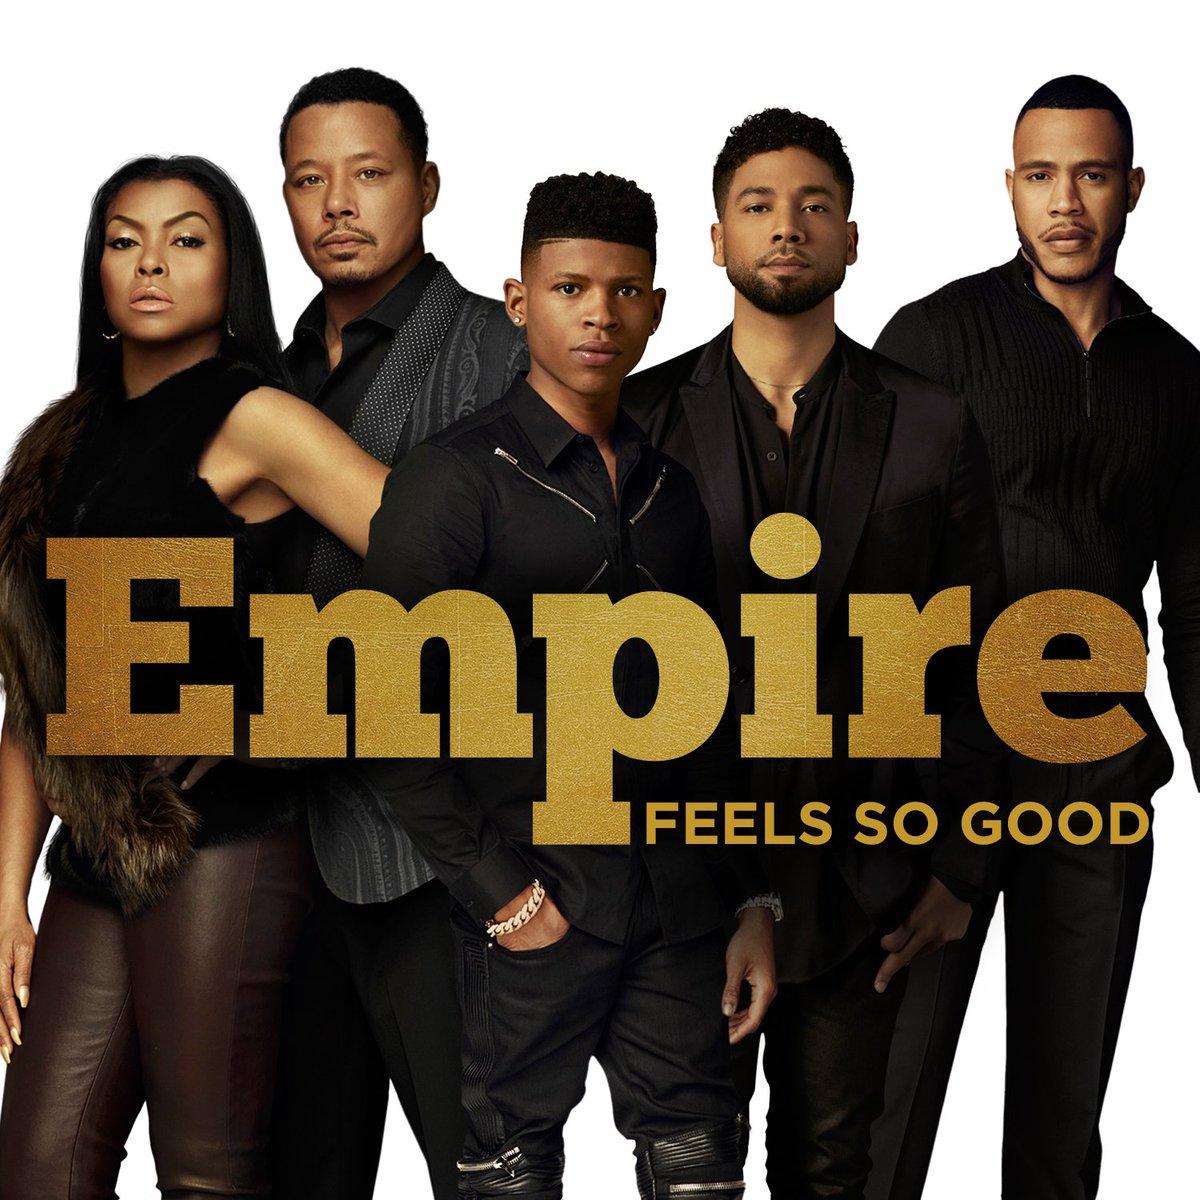 "RT @EmpireFOX: Download ""Feels So Good"" by @JussieSmollett & @TheRue on @AppleMusic now. https://t.co/oQTsPr1mSc https://t.co/6iEfXBZXIC"